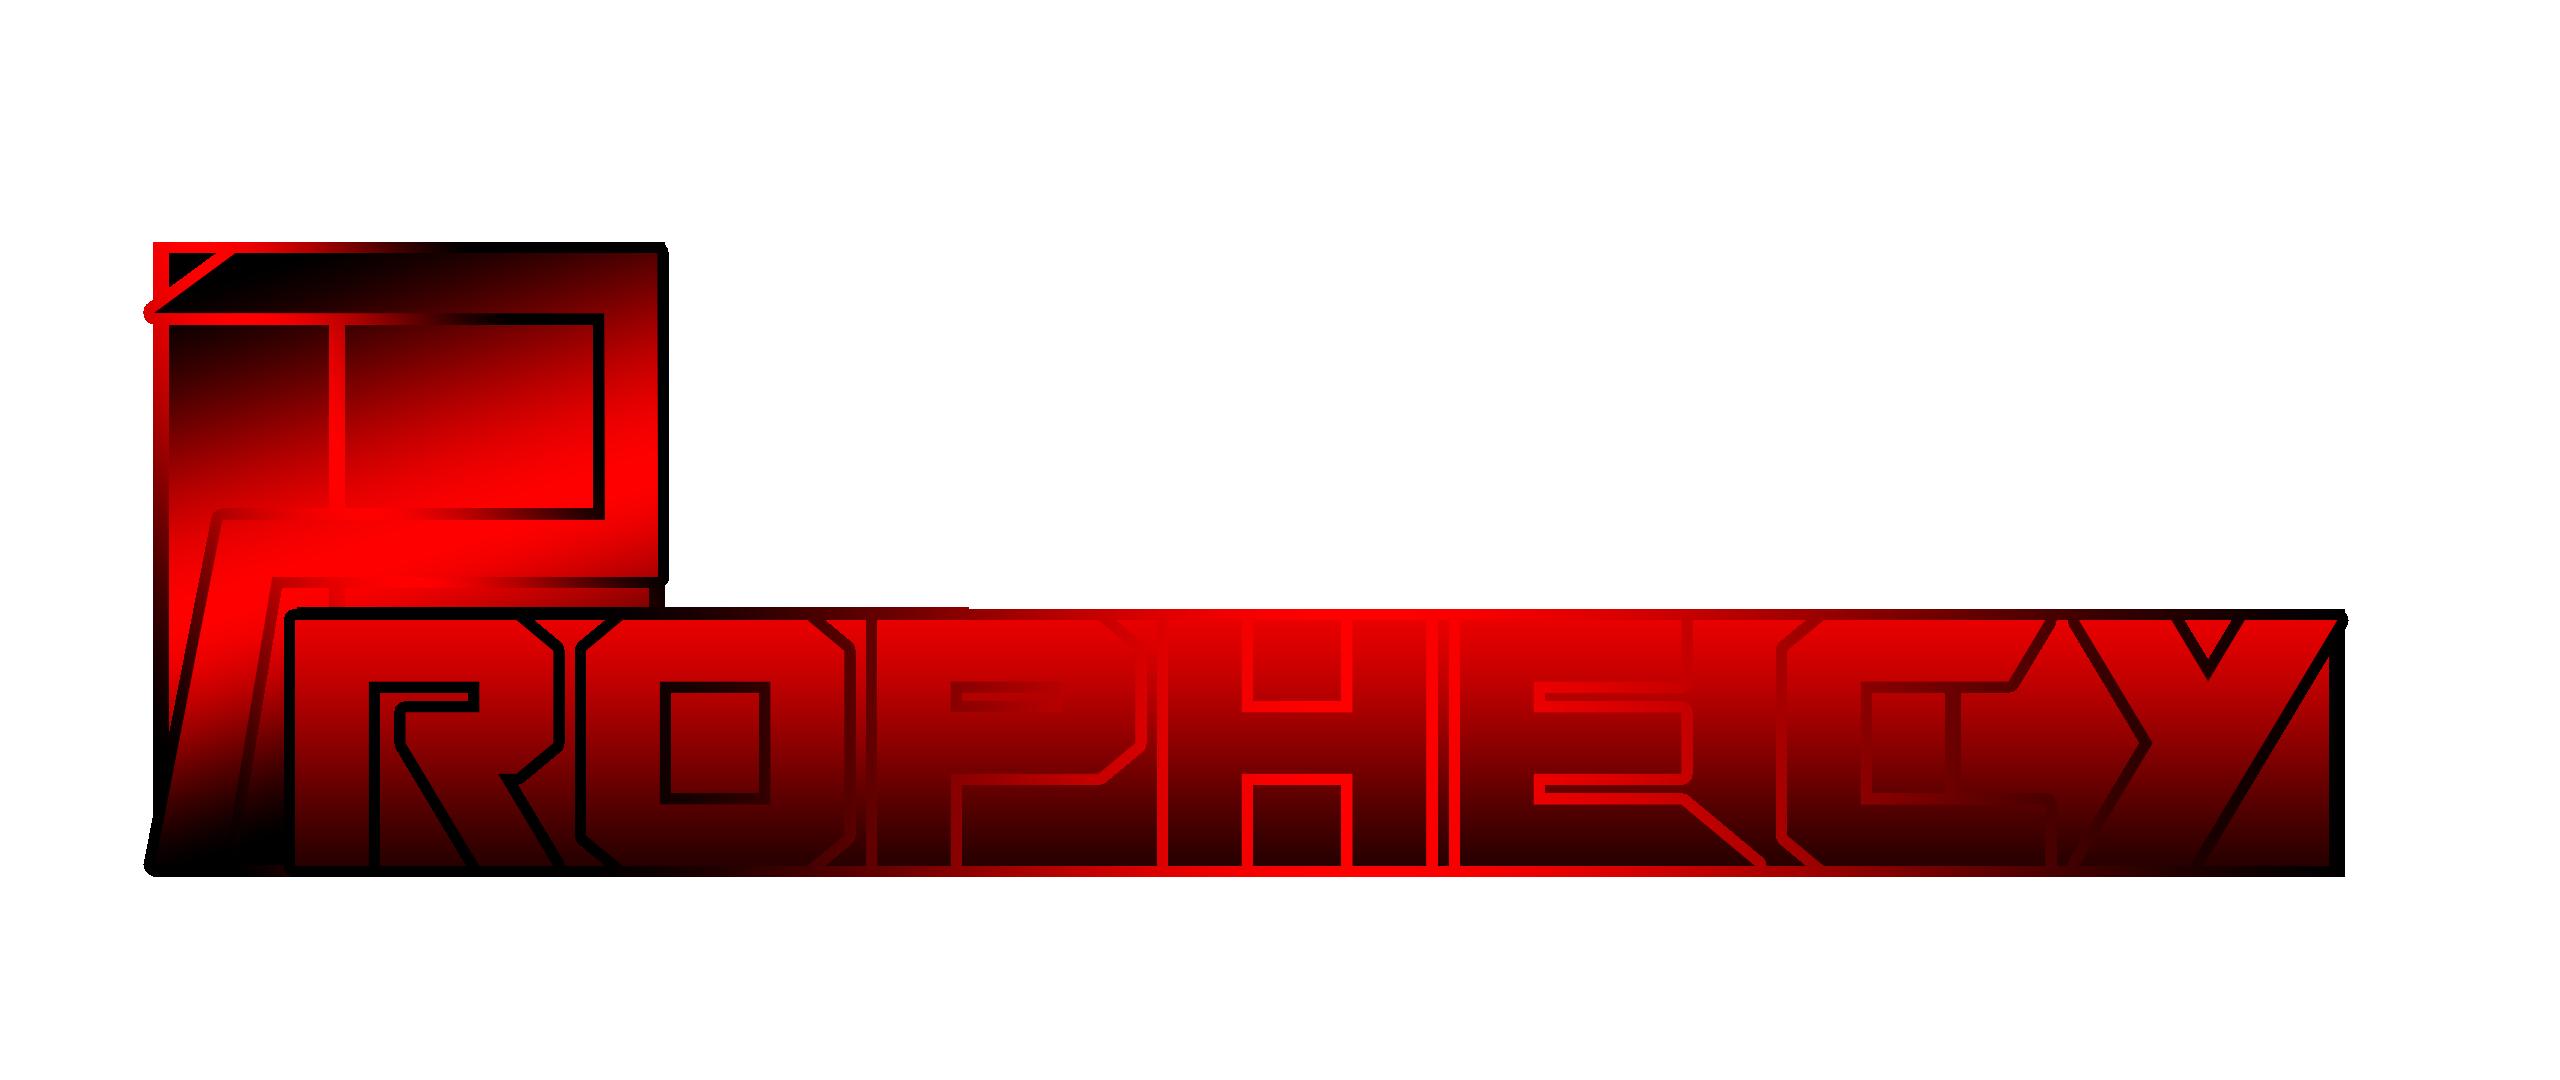 Prophecy Designs